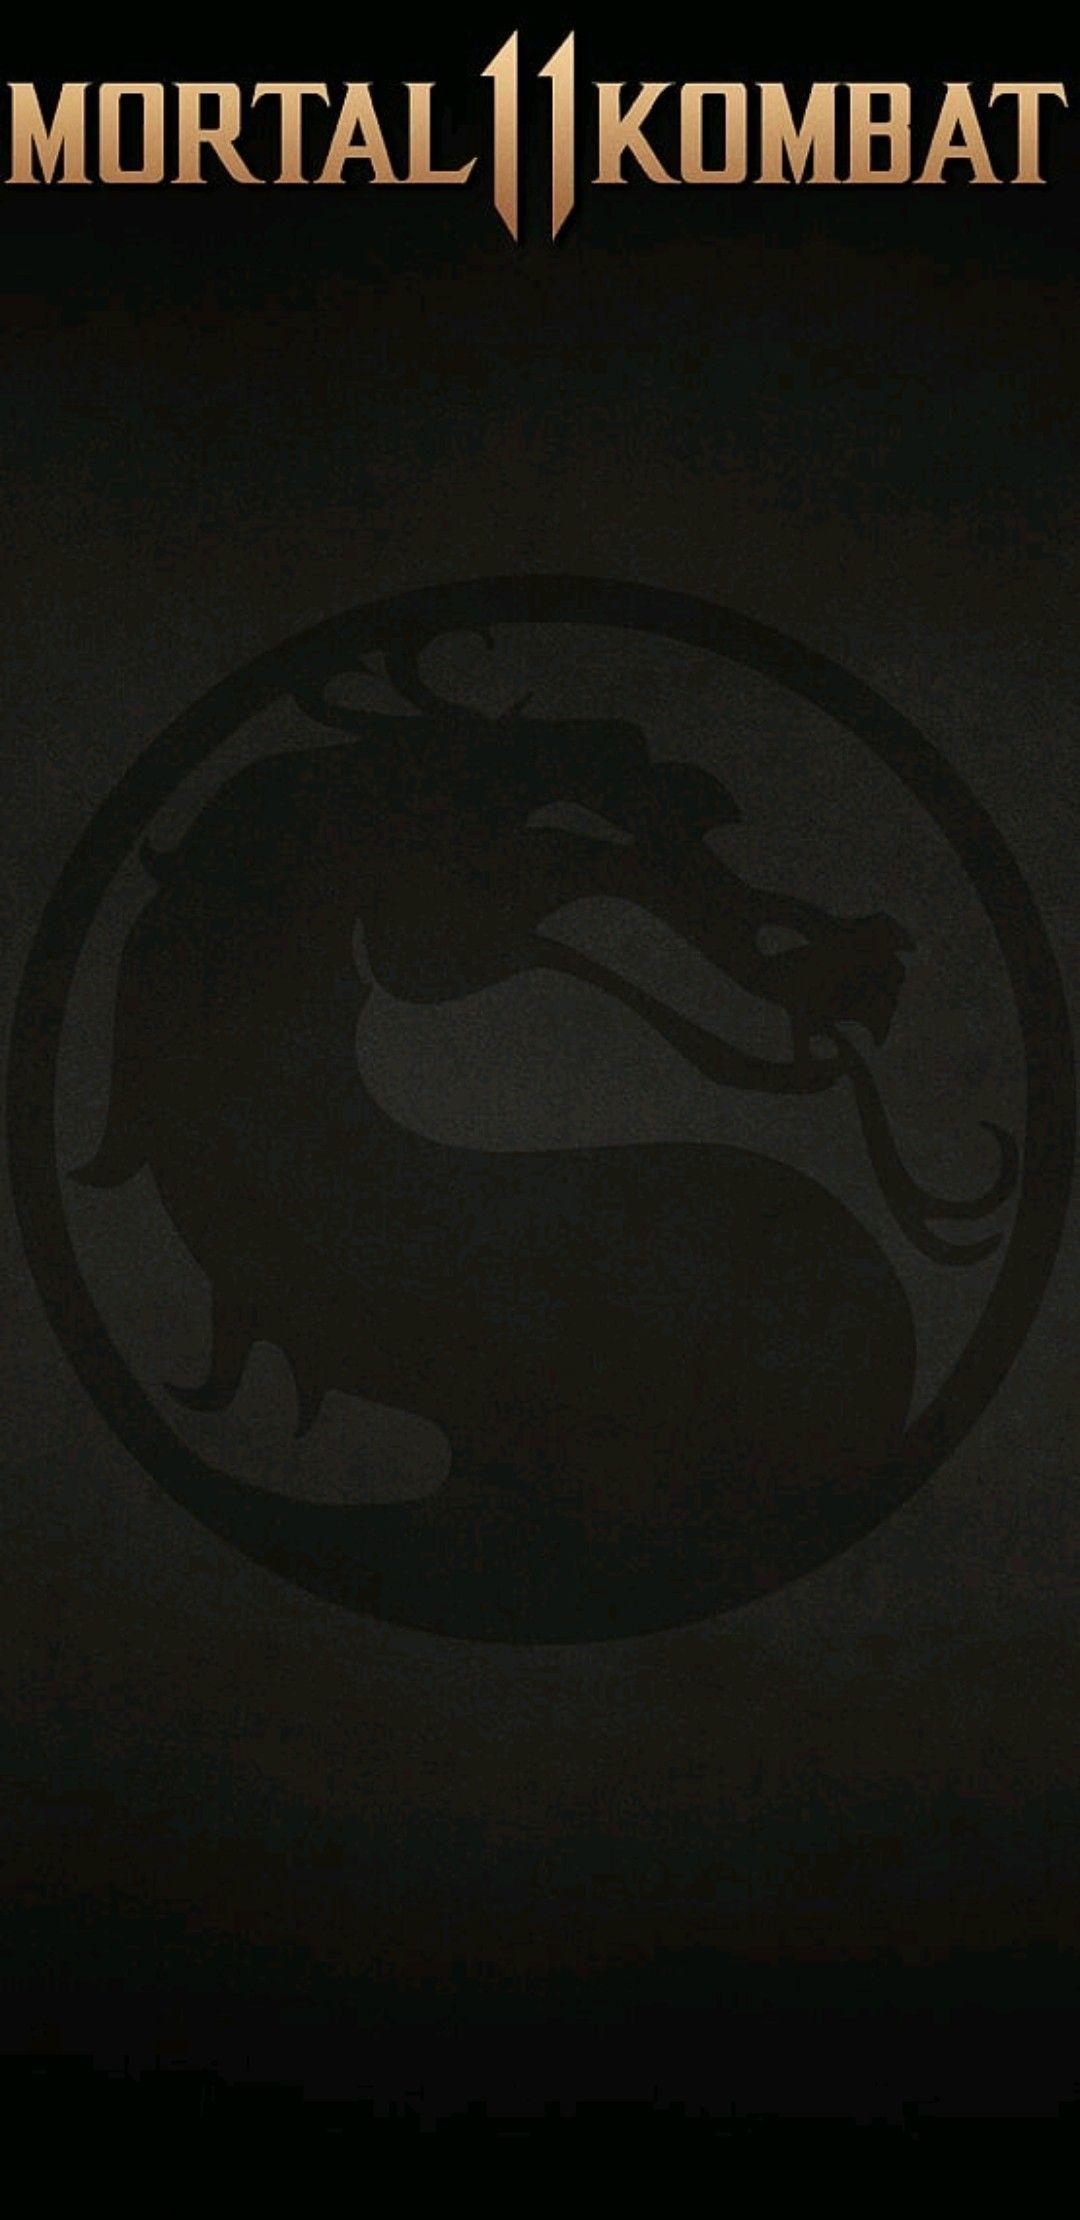 Pin by Steve Splechter on Mortal kombat   Mortal kombat